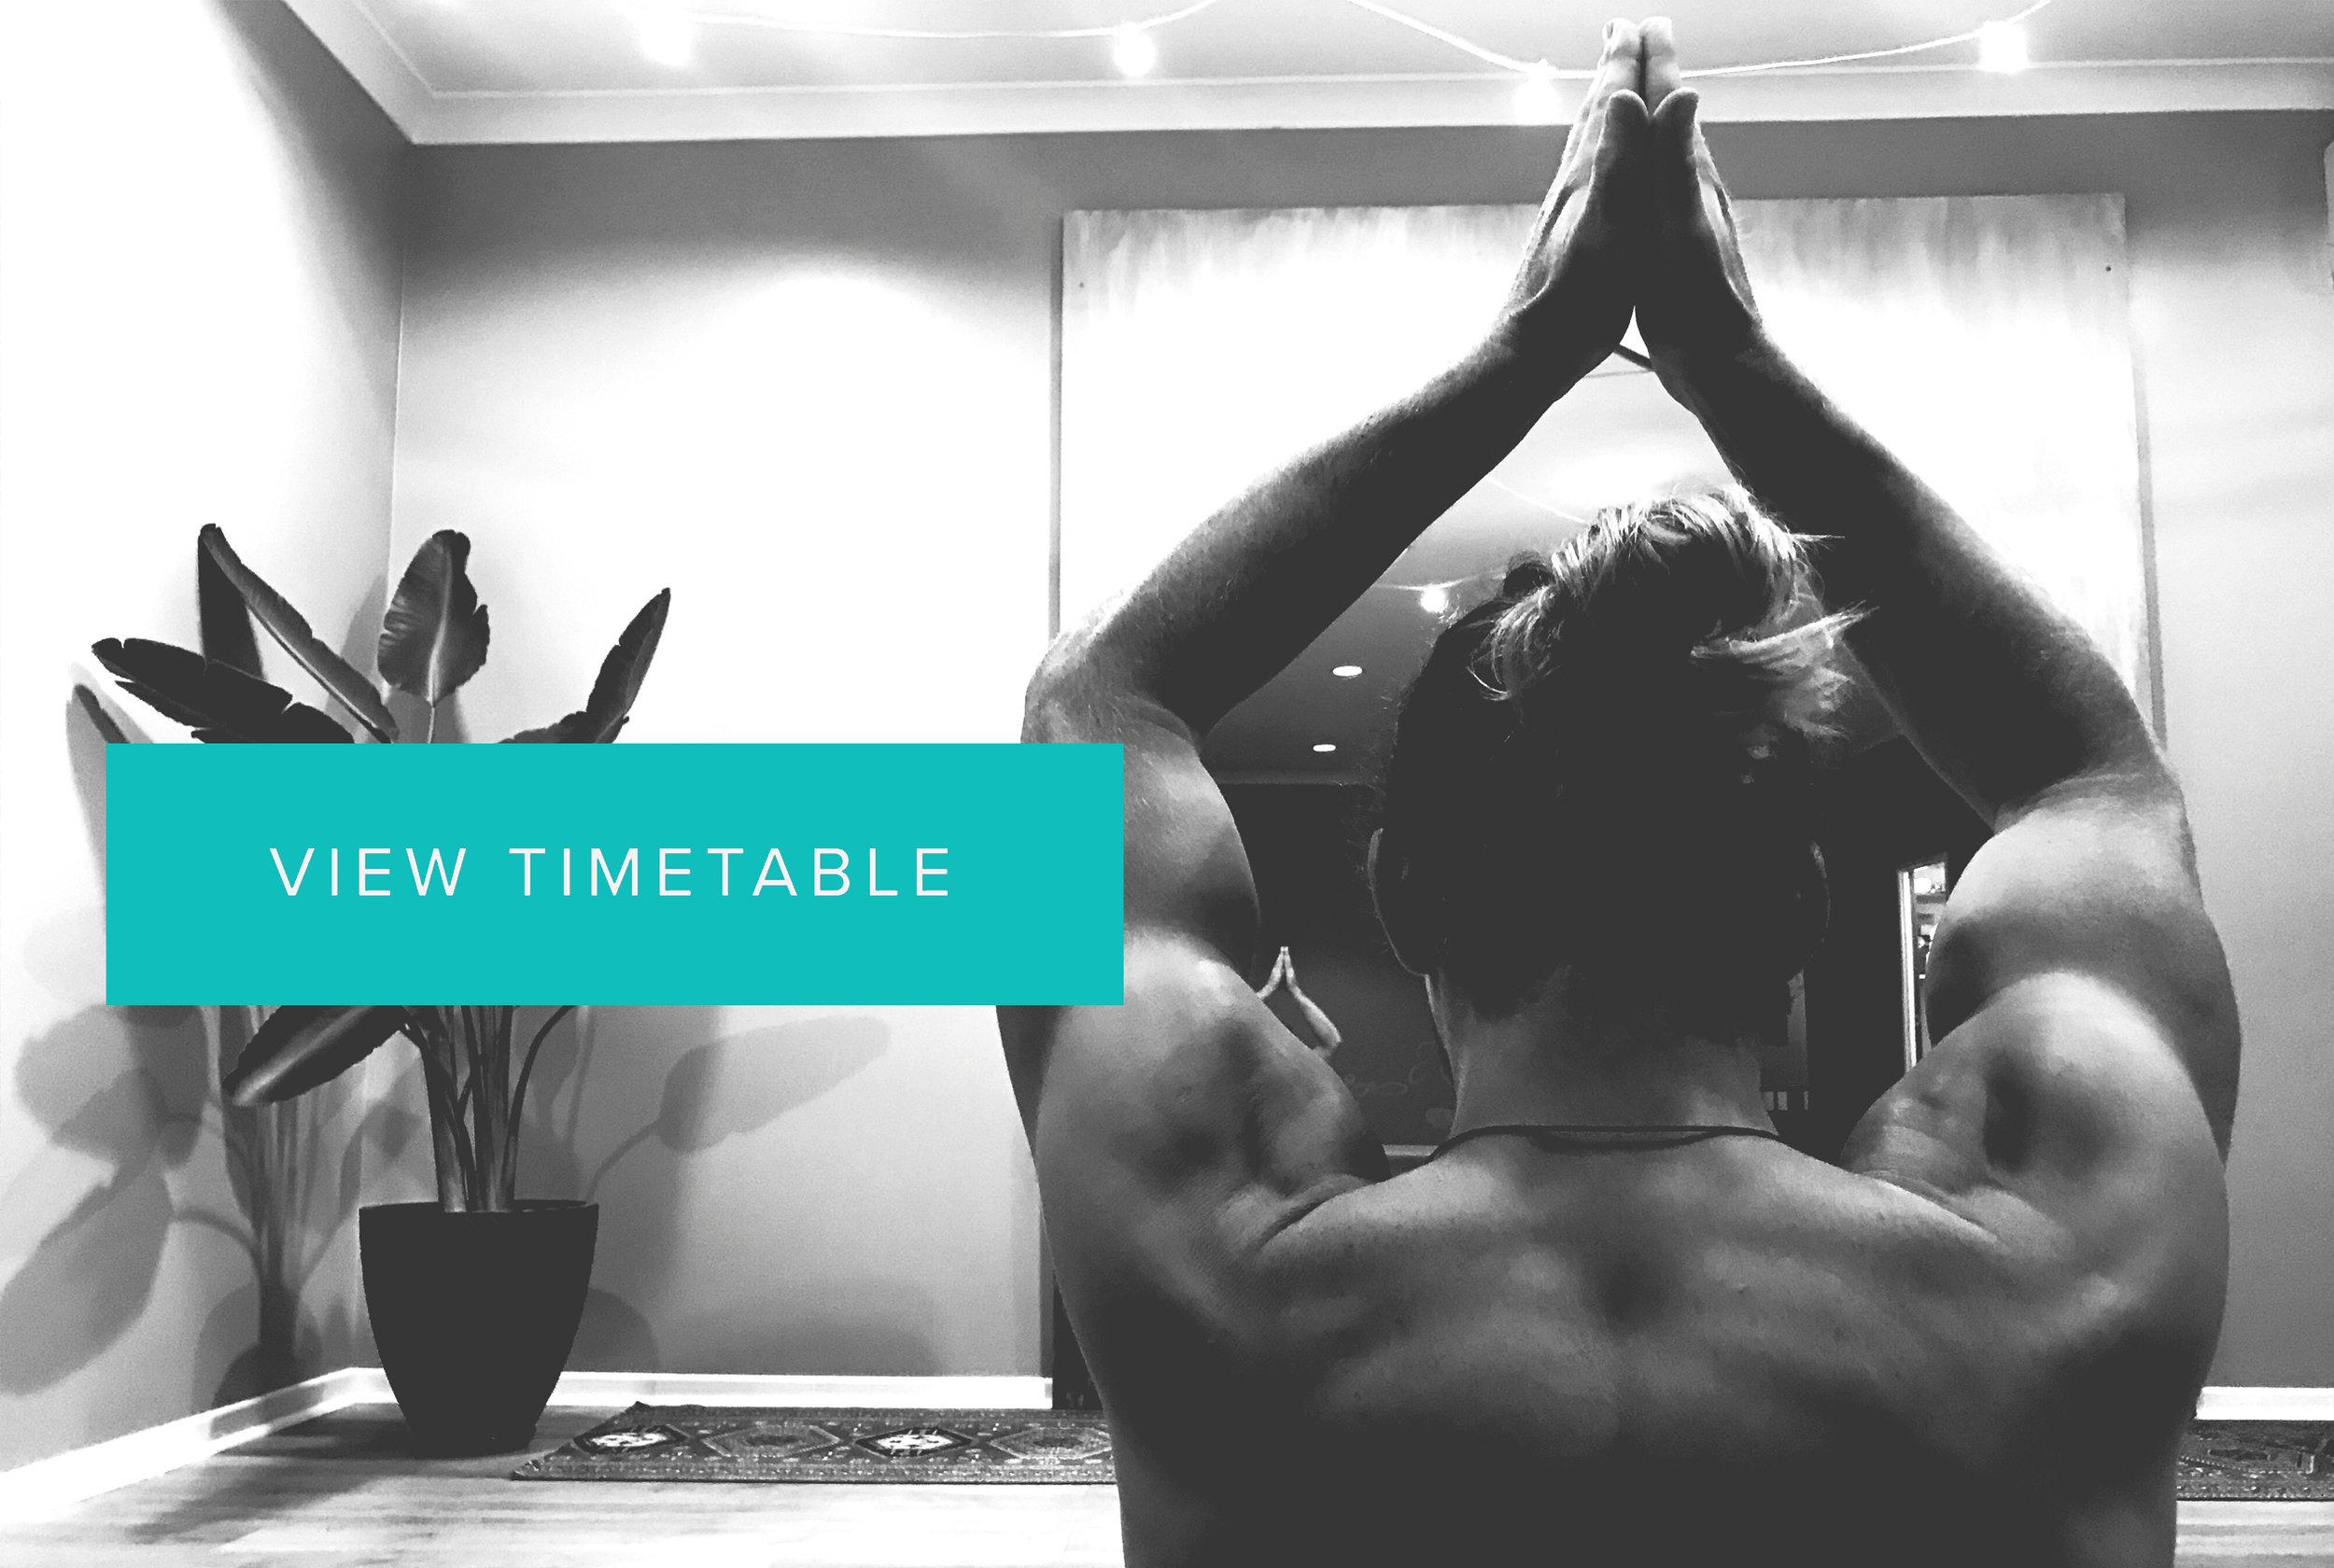 classes in toowoomba yoga view timetable tim yoga mens .jpg